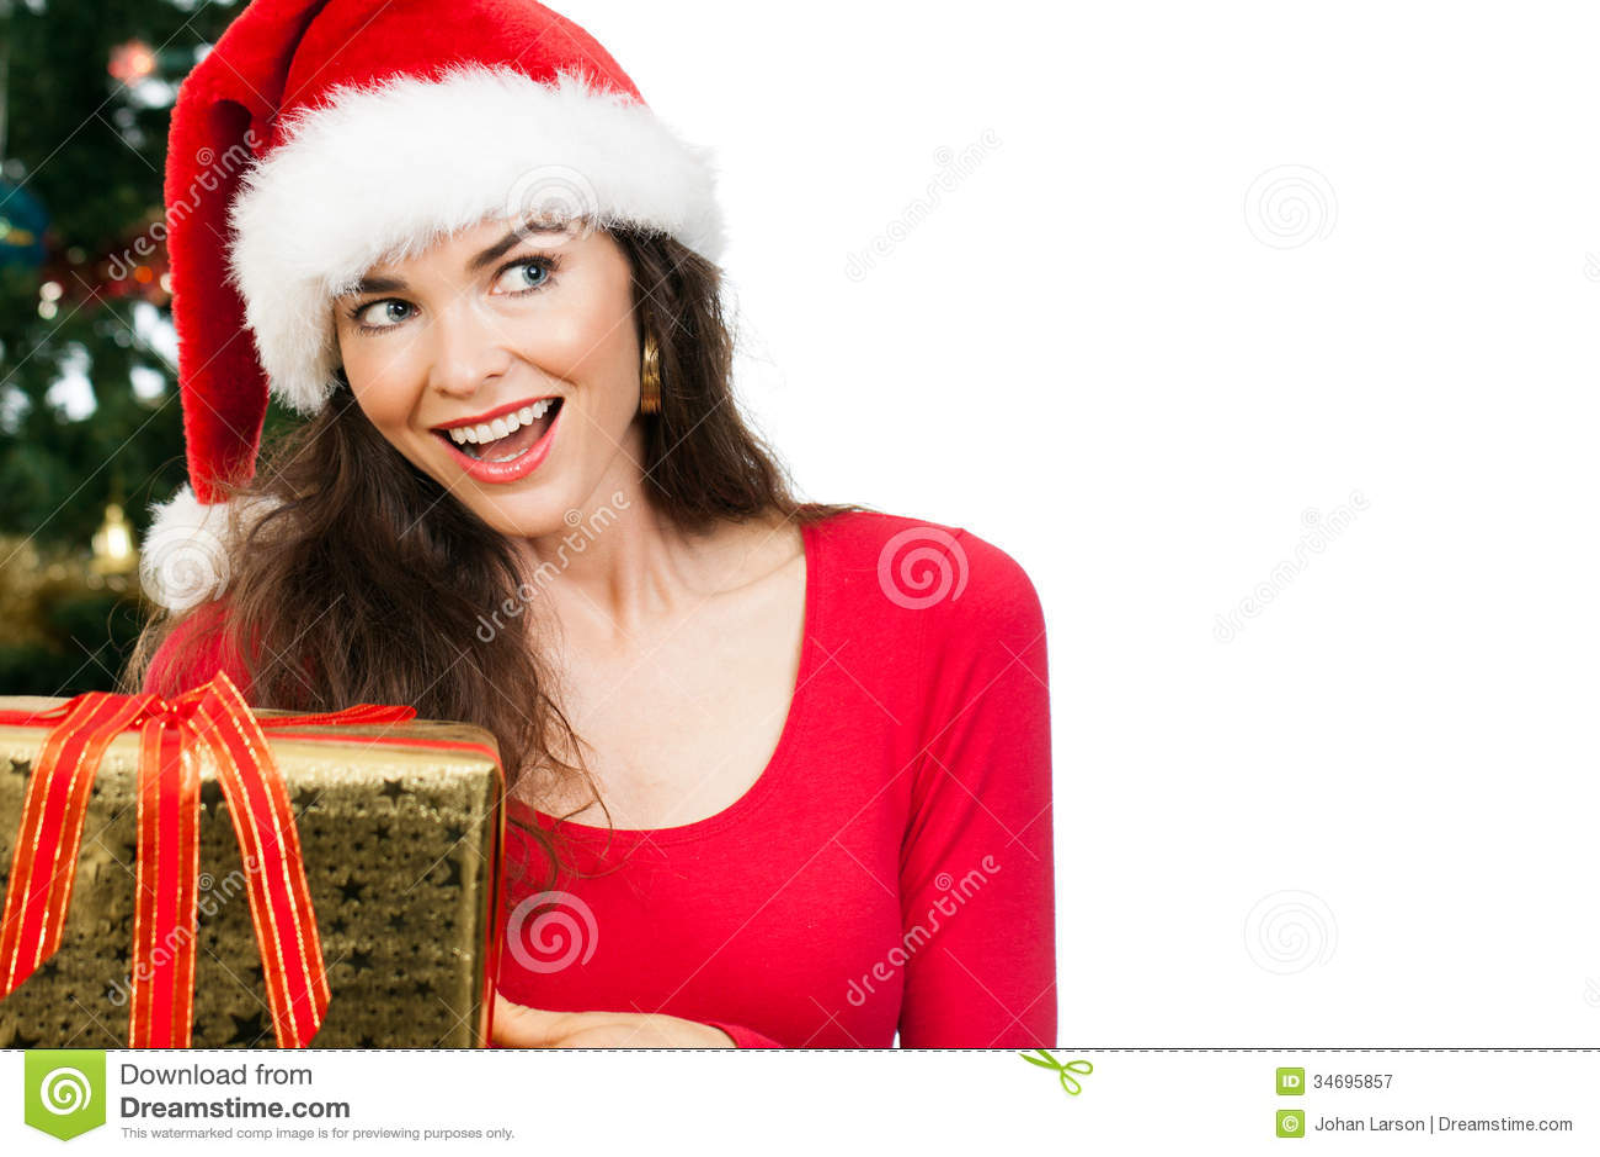 Women Holding Christmas Gift Royalty Free Stock